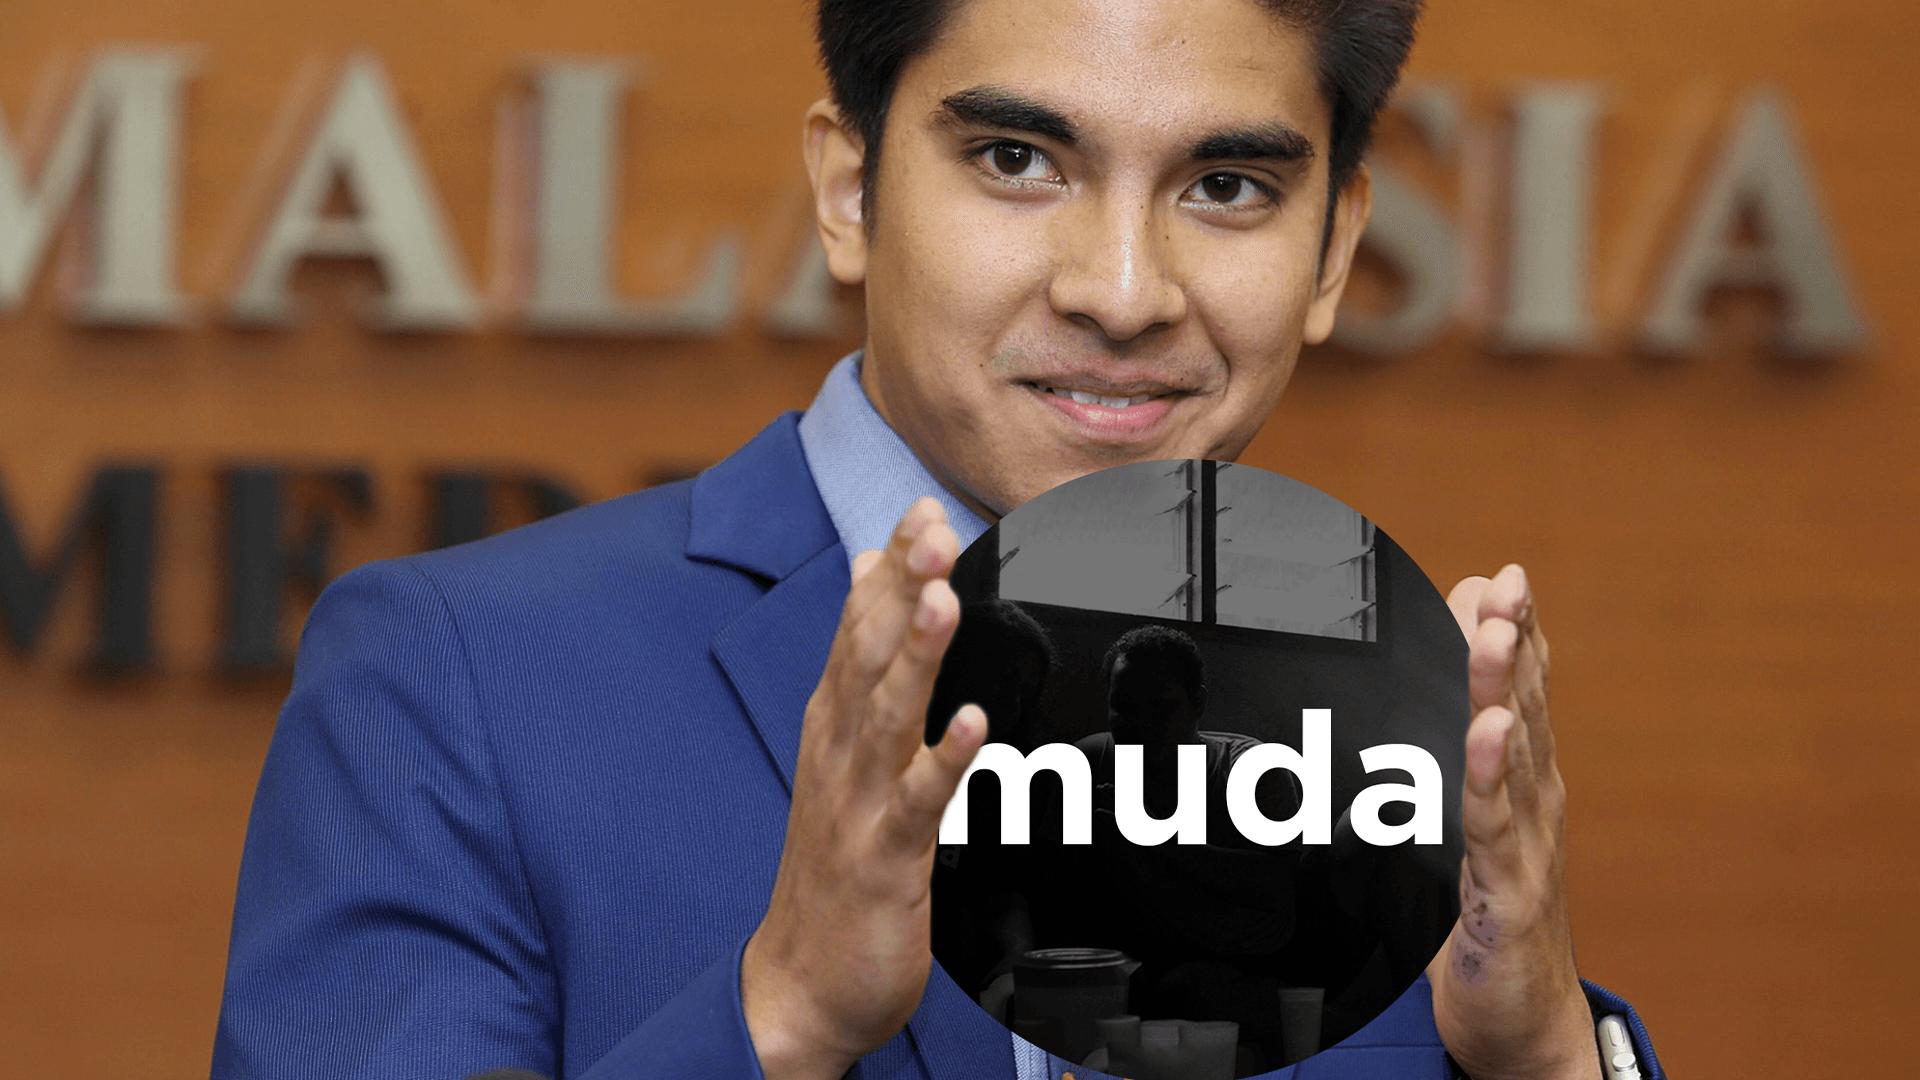 Fakta Kilat: Parti MUDA by Syed Saddiq